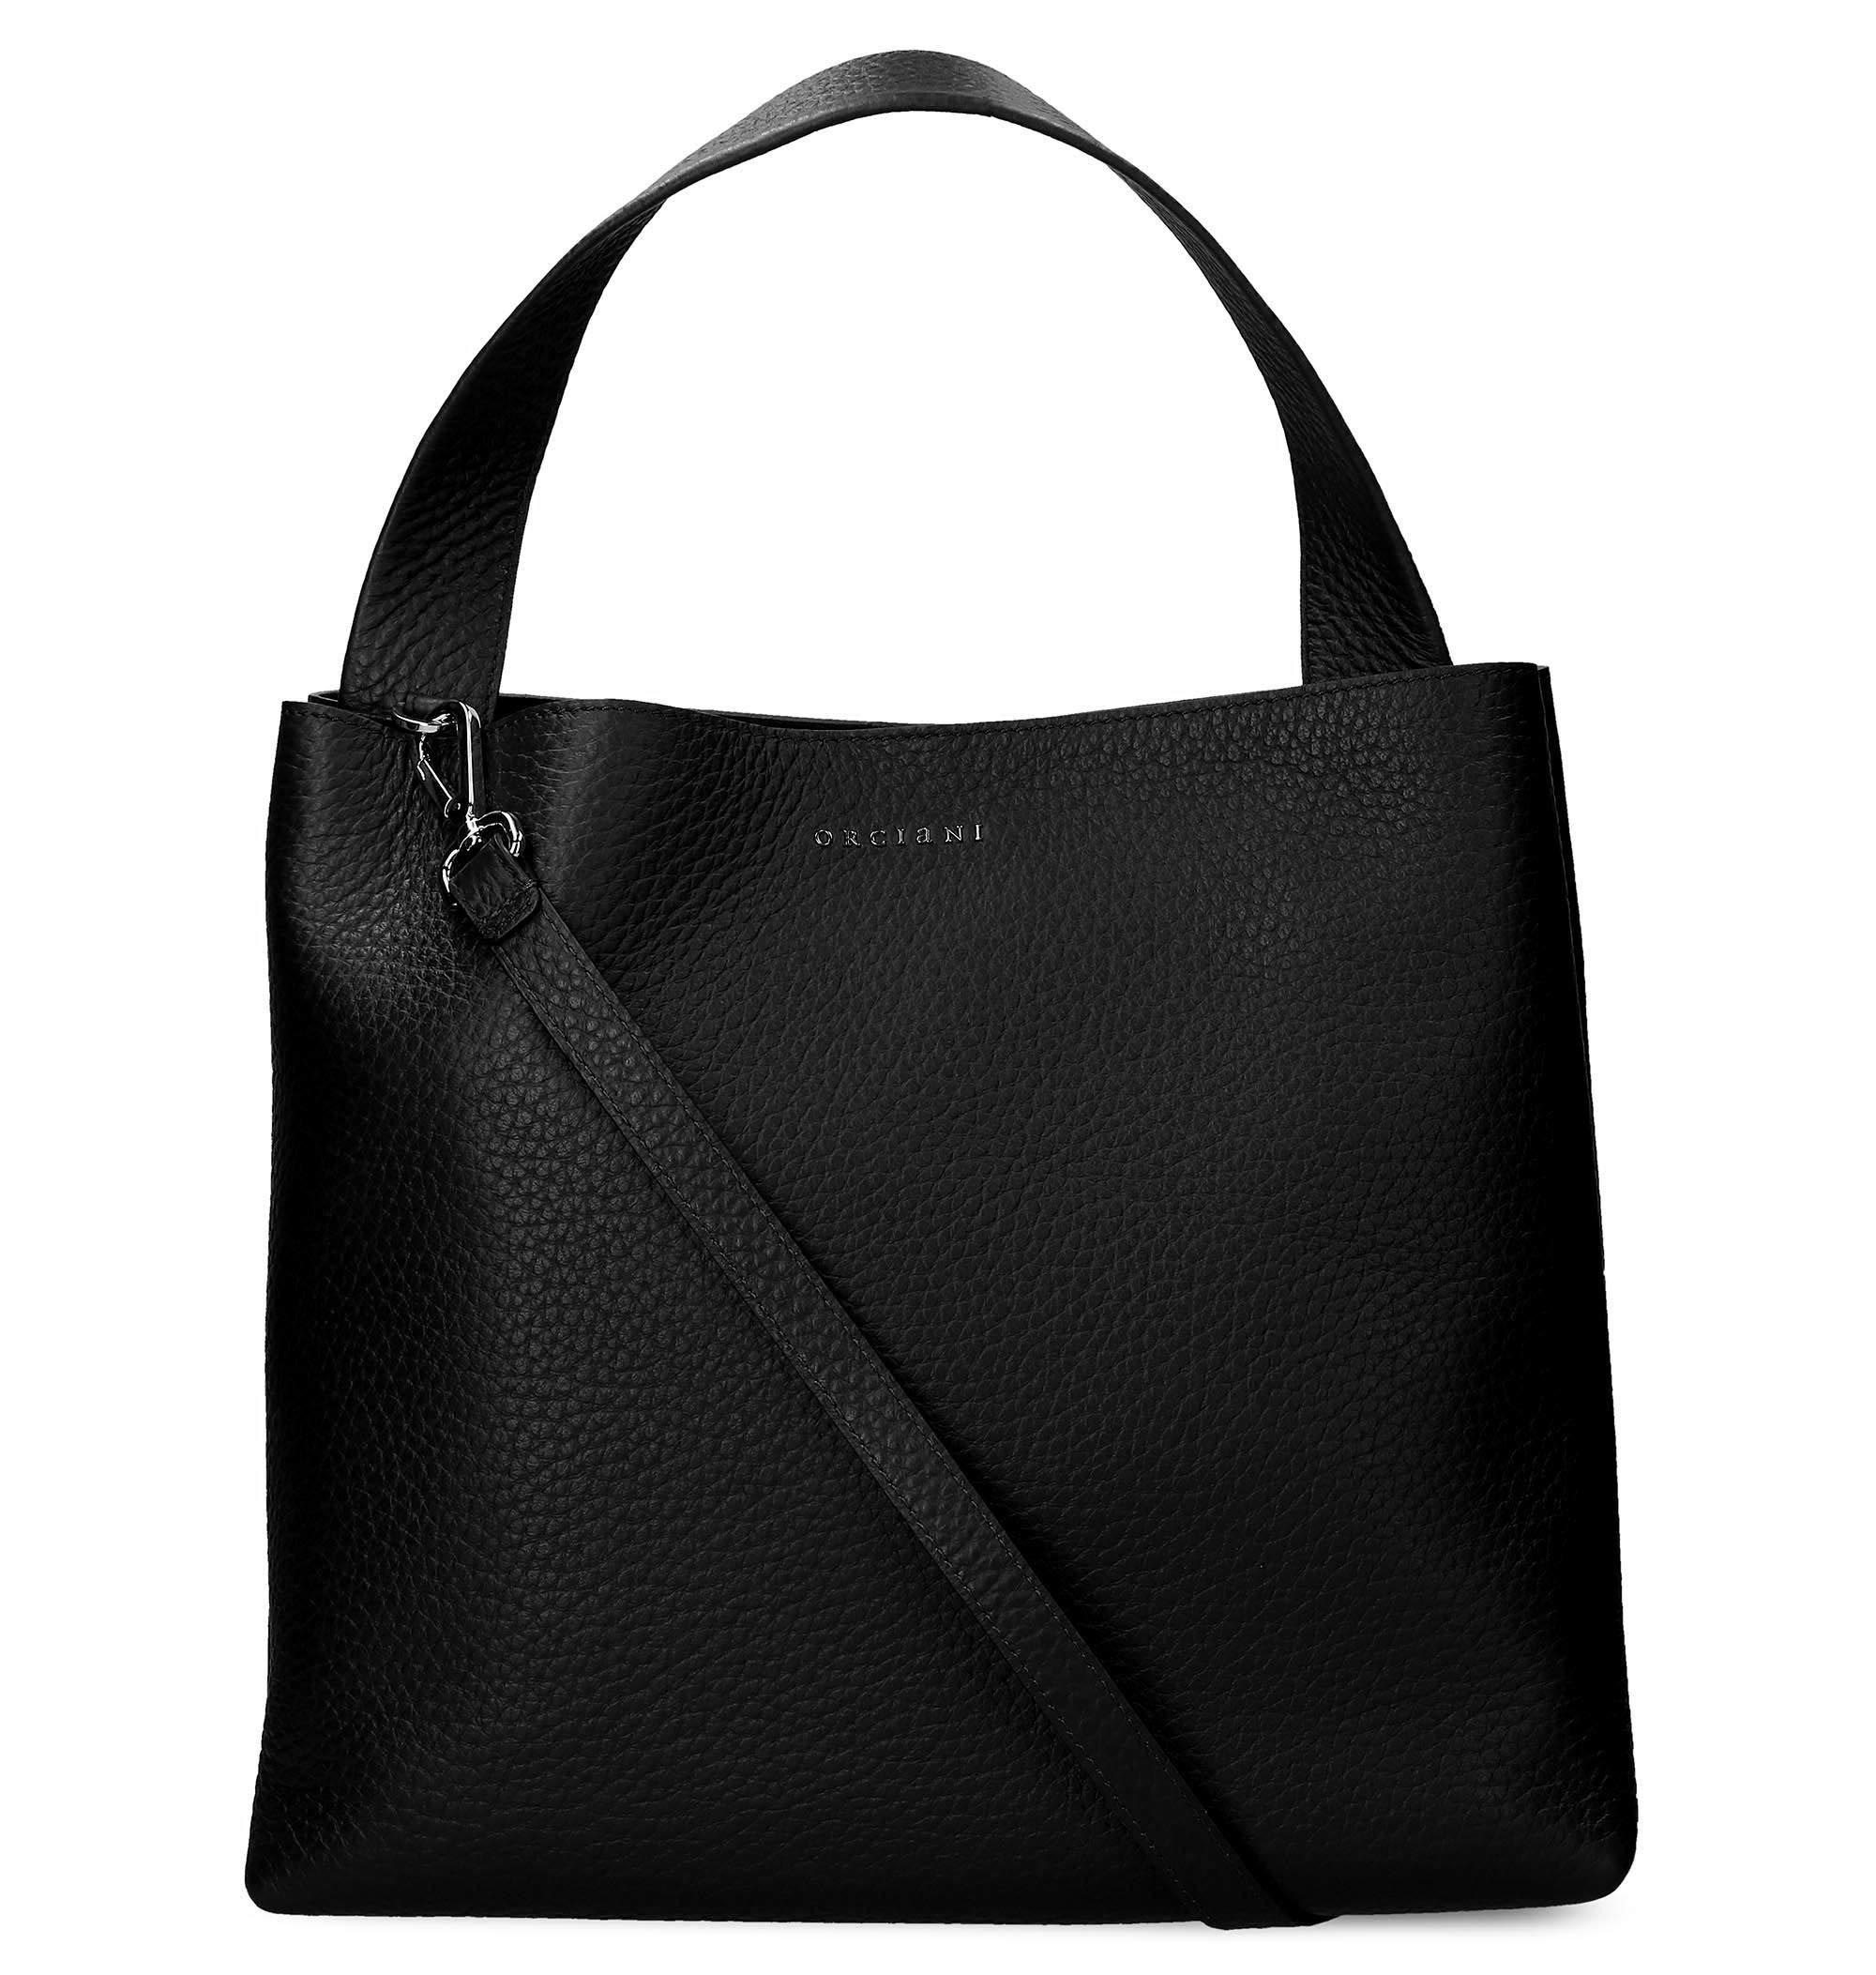 Orciani Women's B02031softnero Black Leather Tote